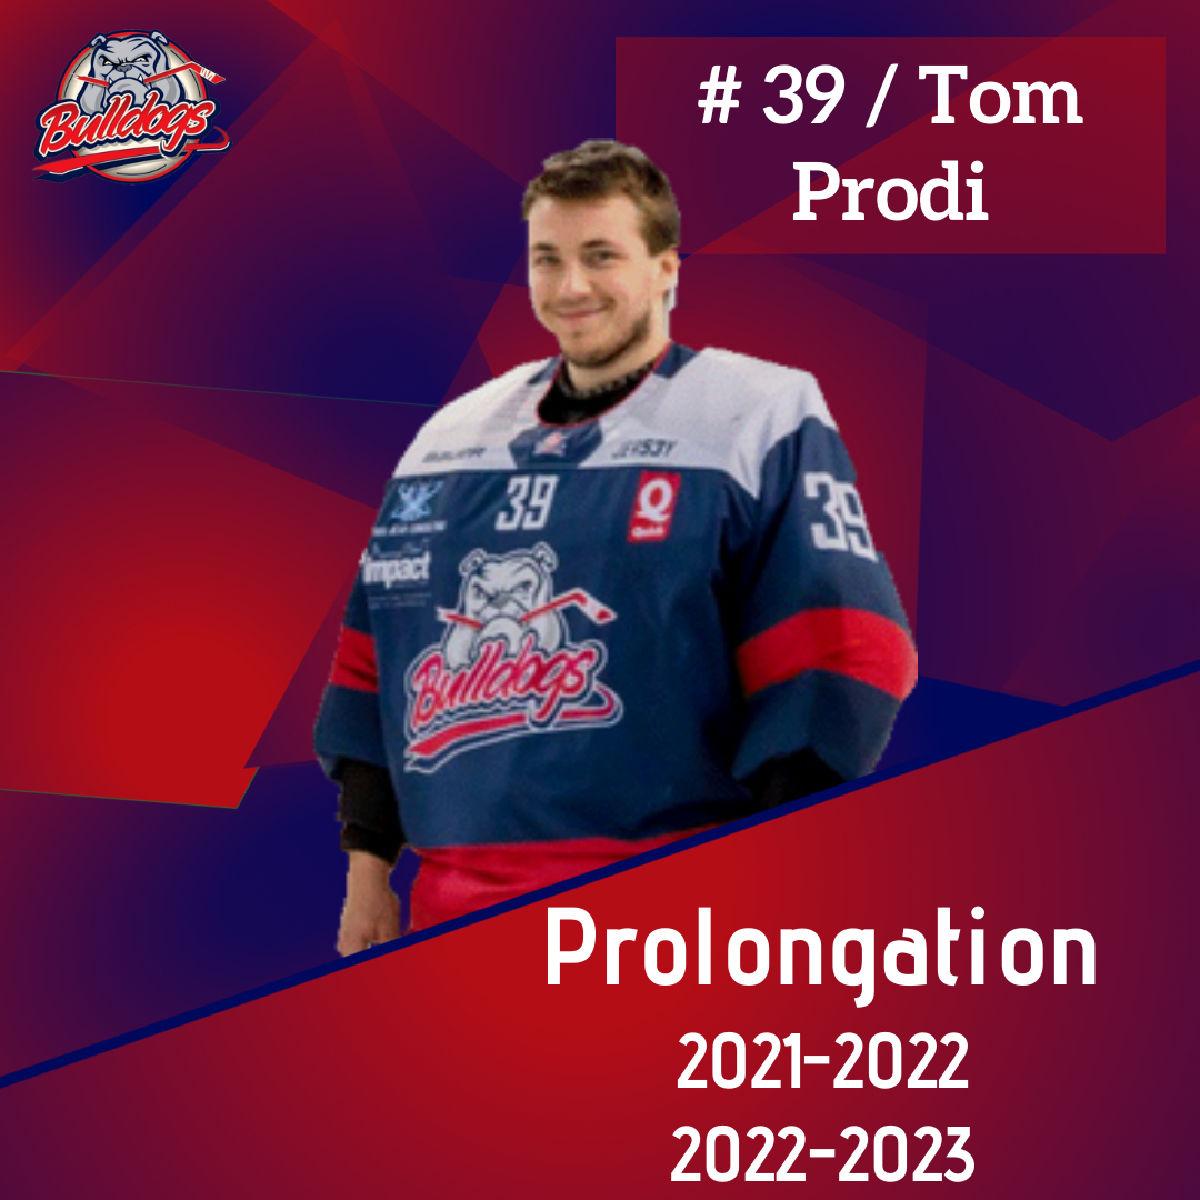 Prolongation pour Tom Prodi jusqu'en 2023